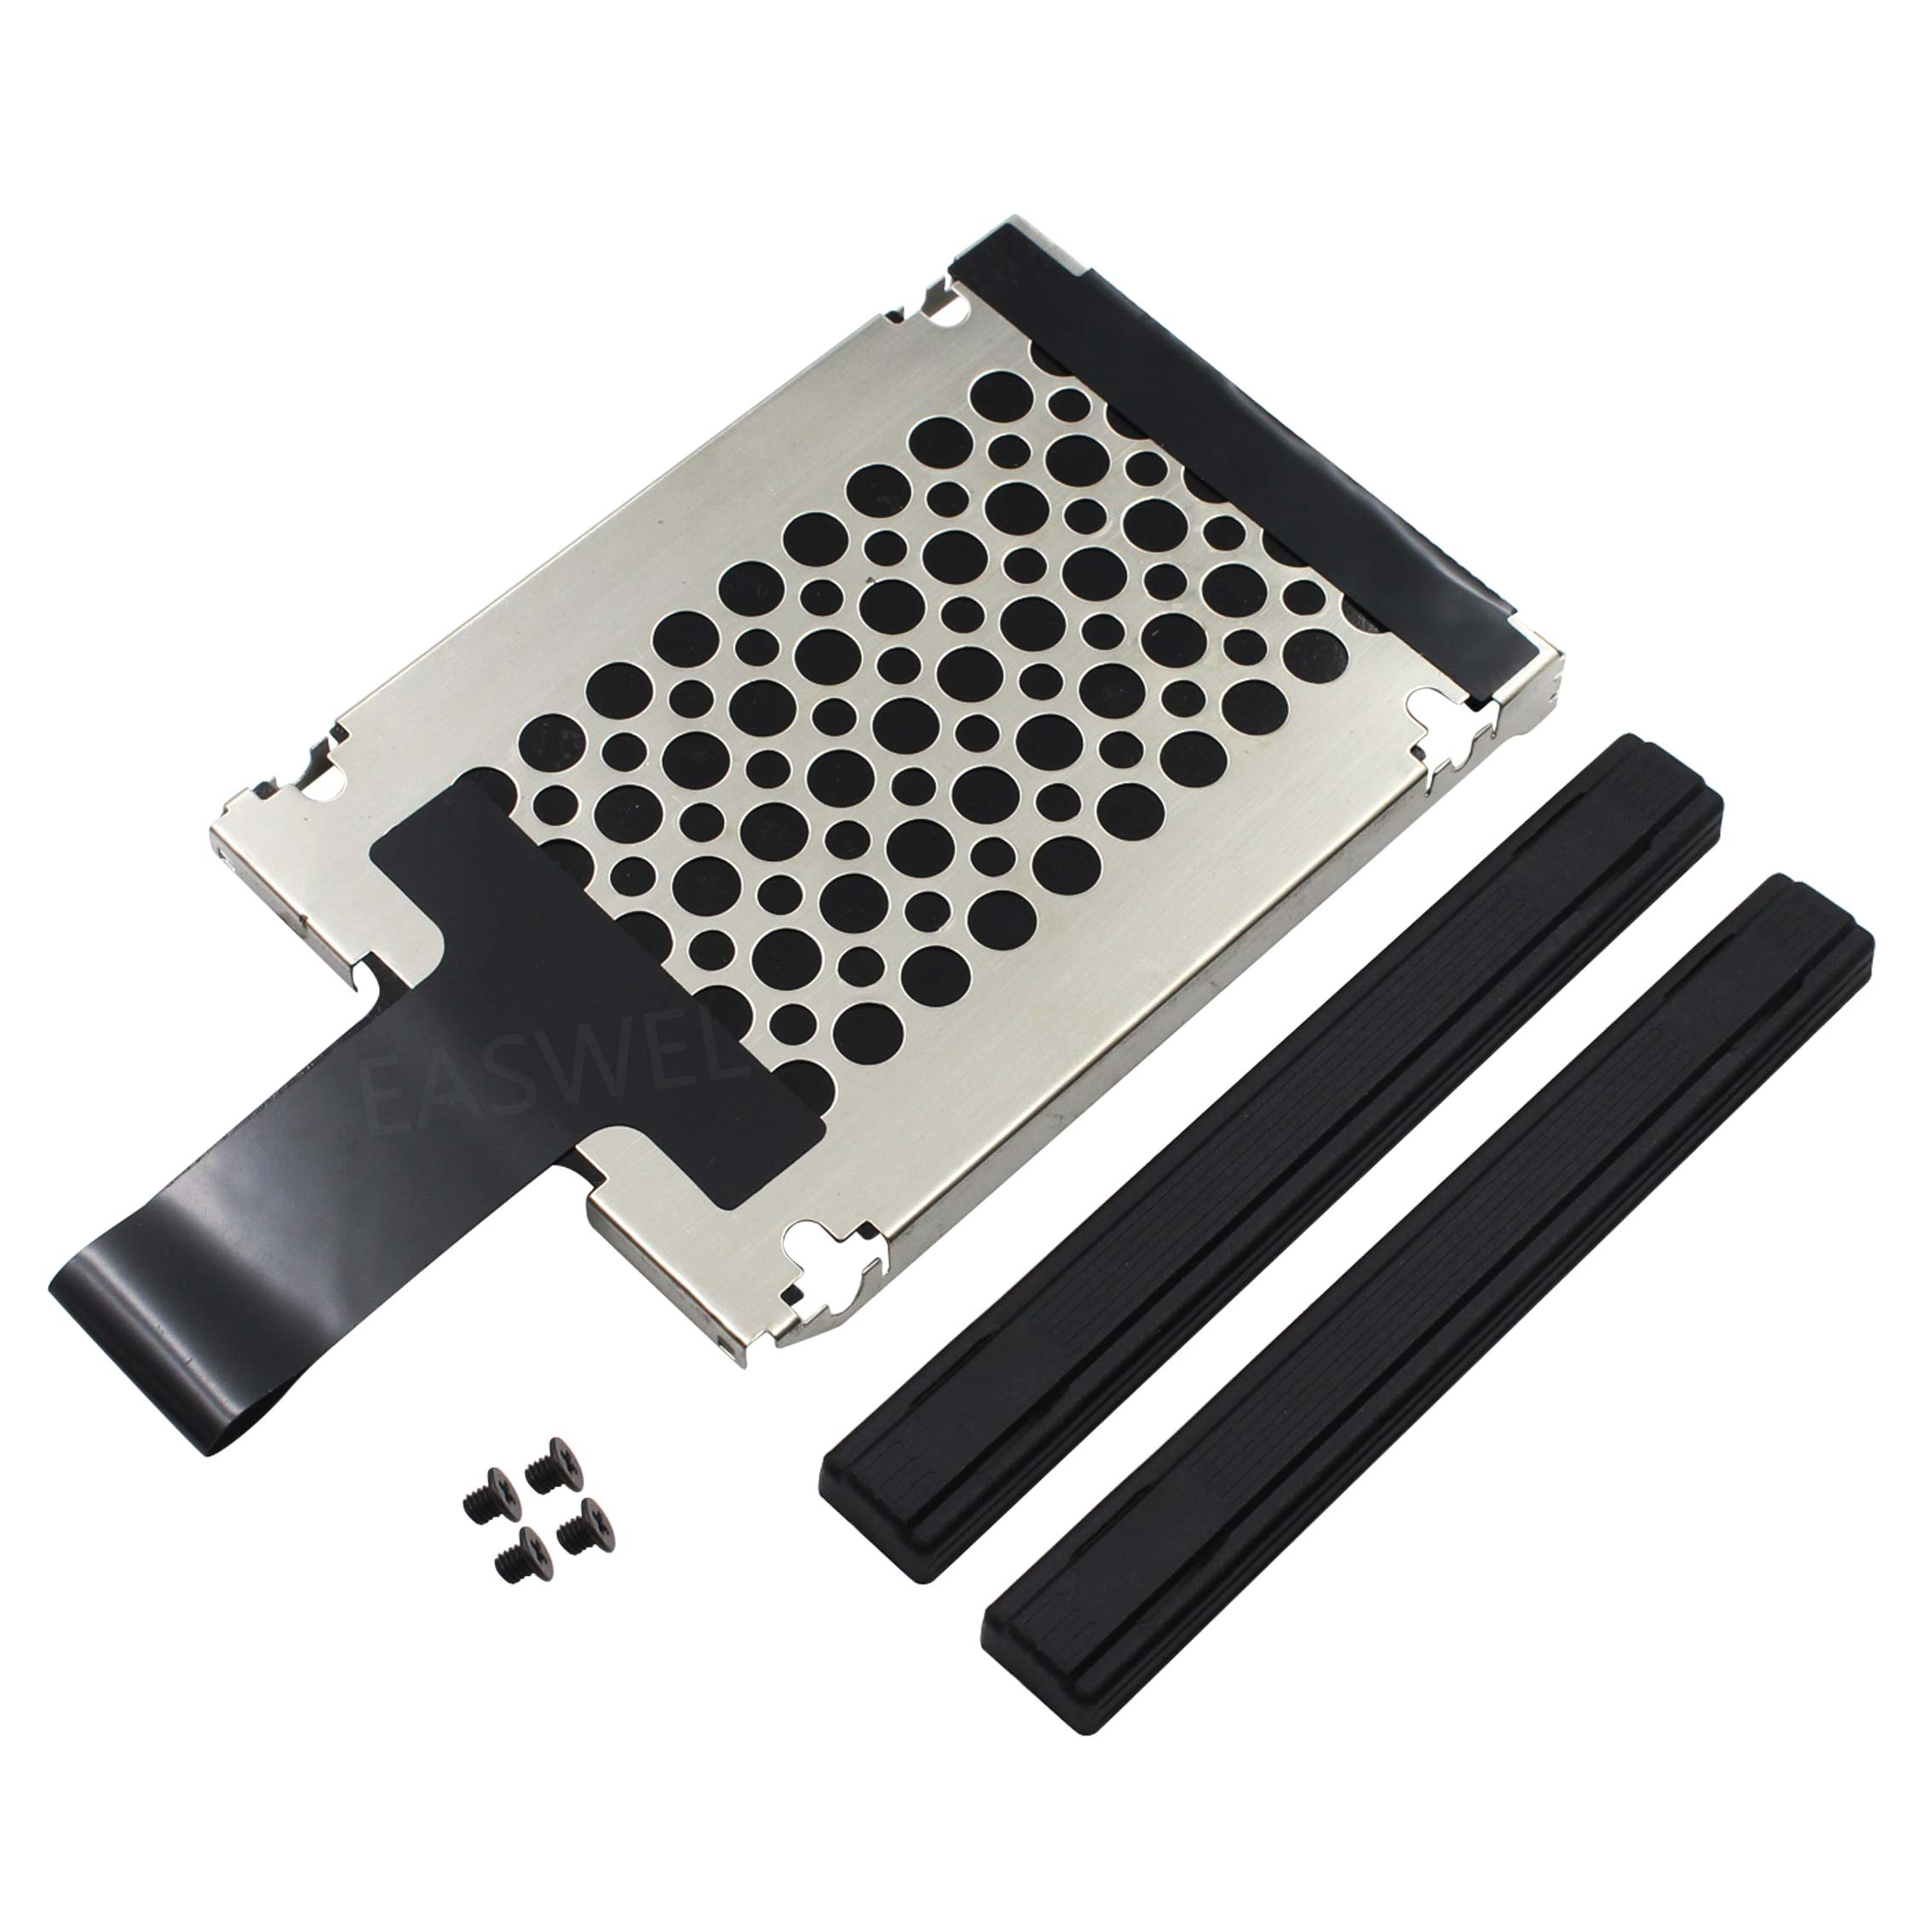 50 Uds HDD Disco Duro Caddy Rail & tornillos para Lenovo IBM Thinkpad T410S T500 T510 R400